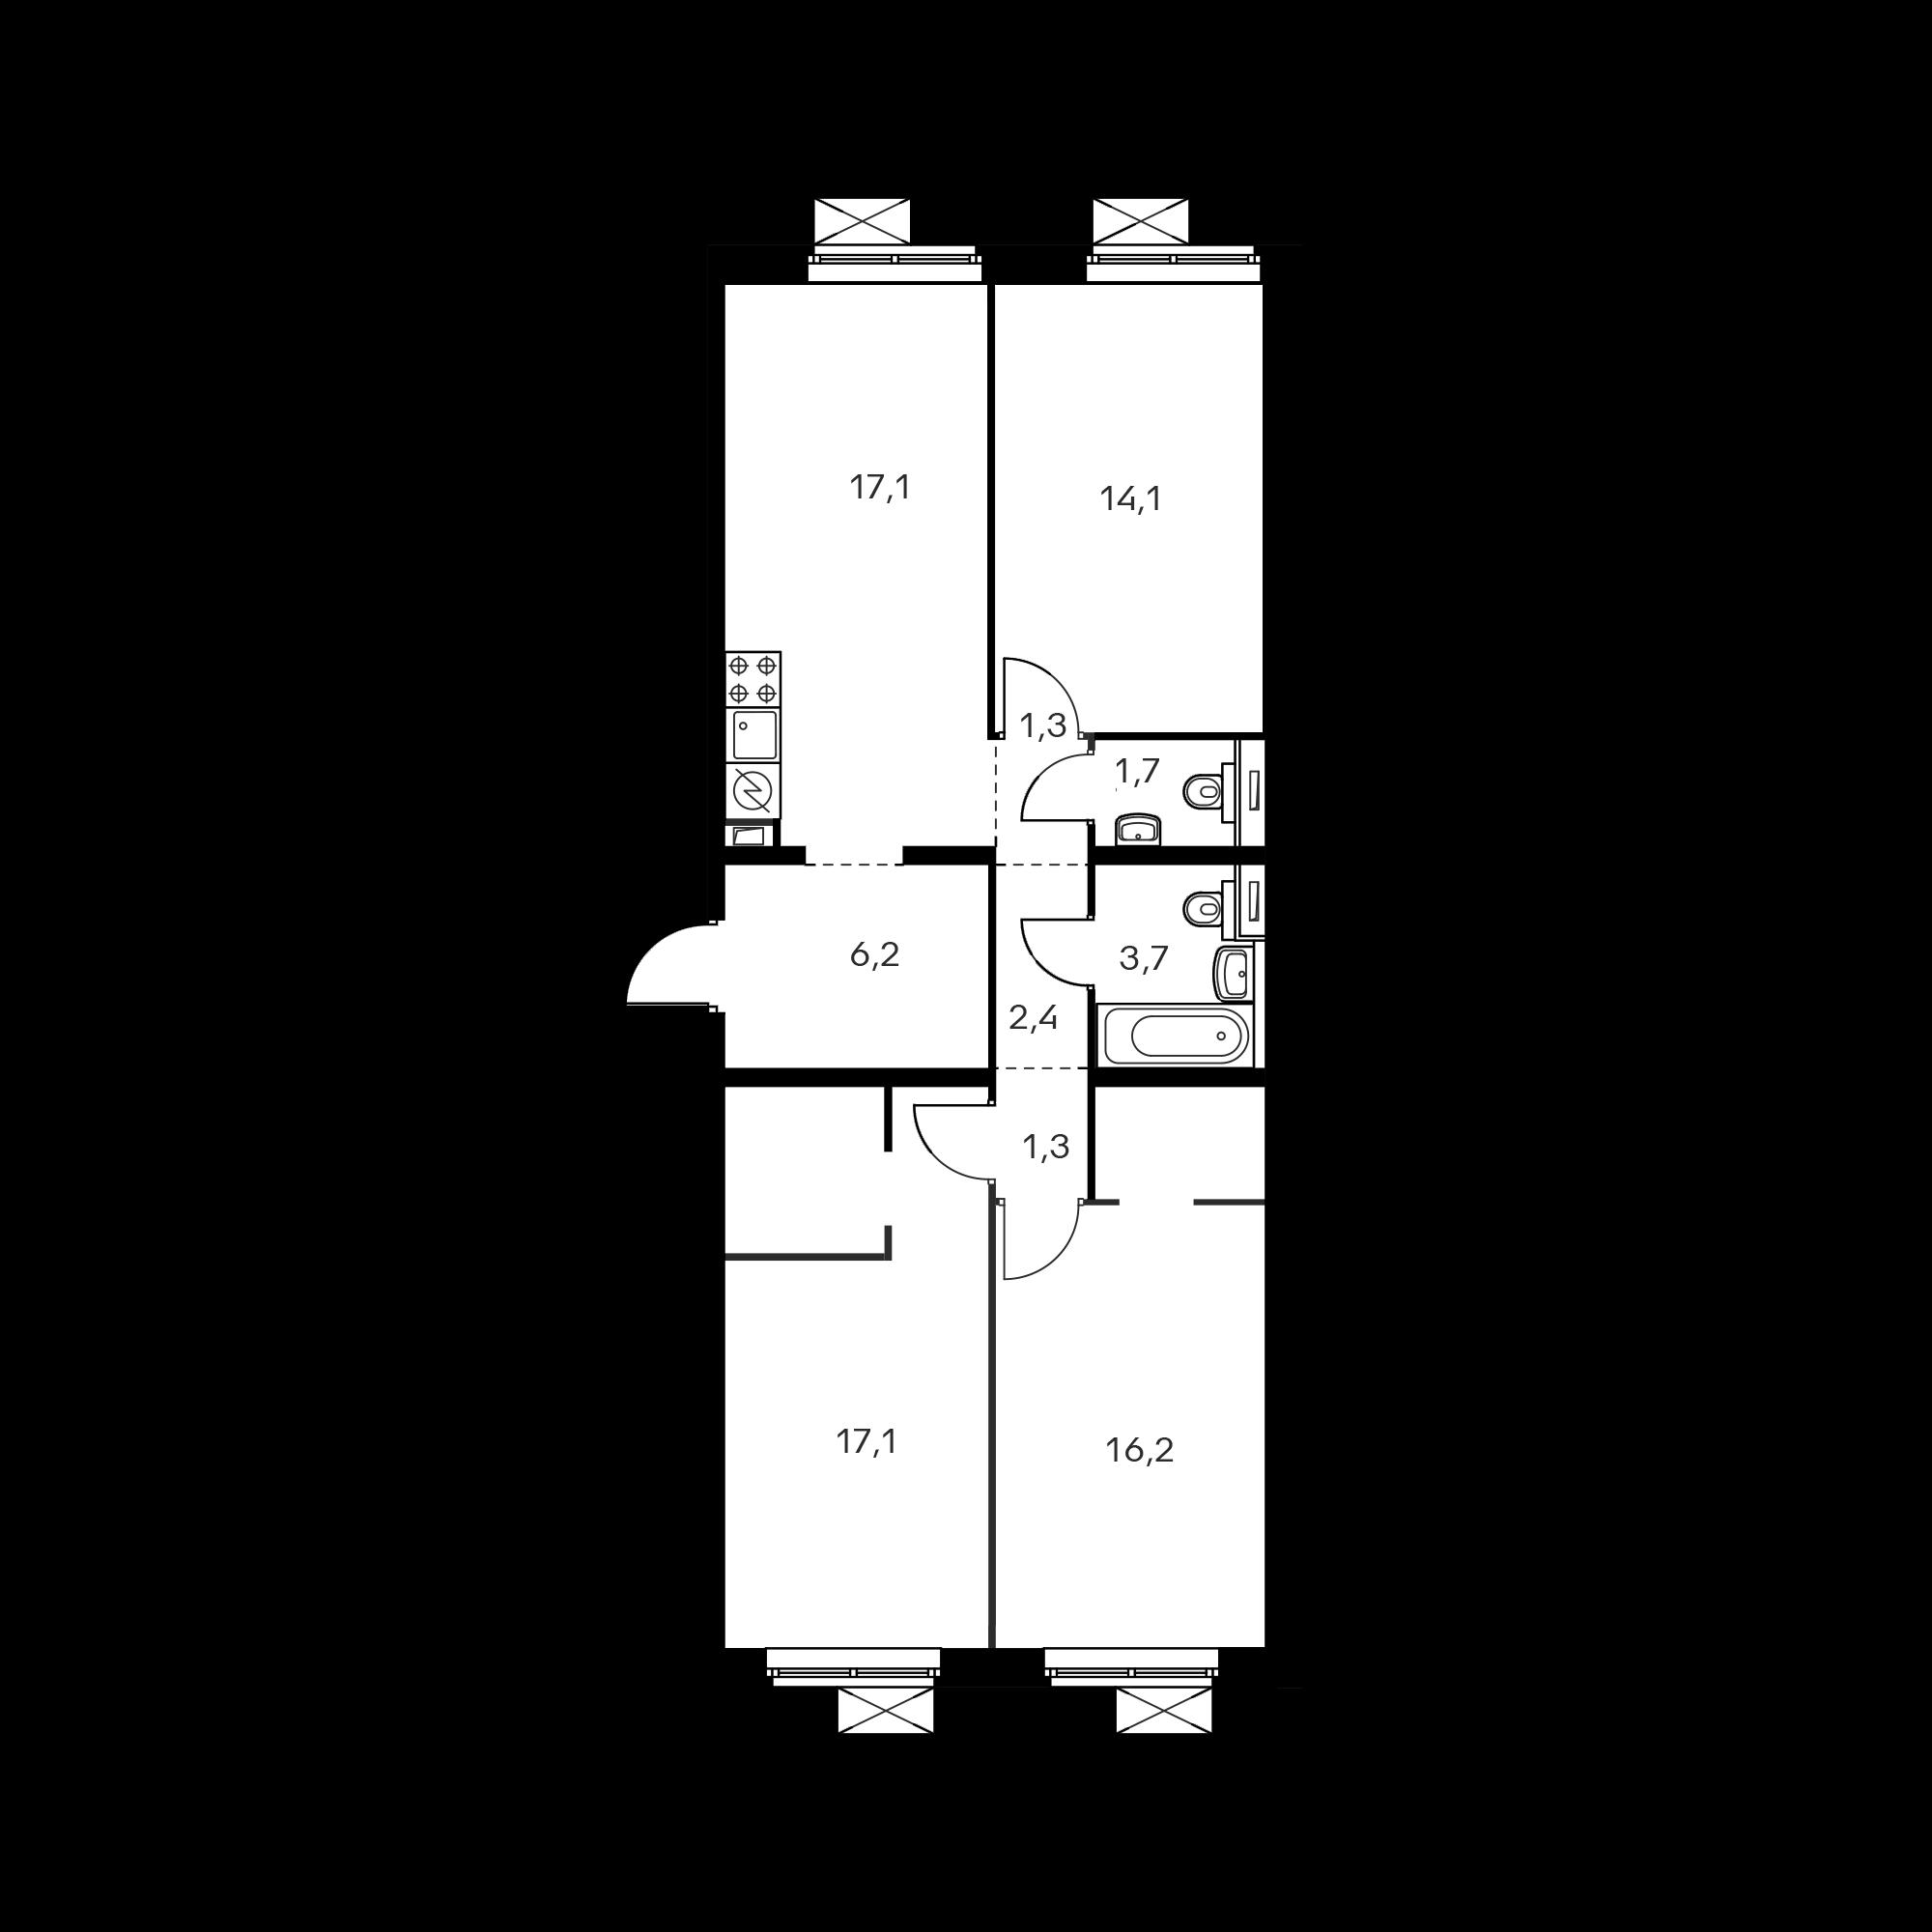 3KM16_6.0-1_S_Z-02